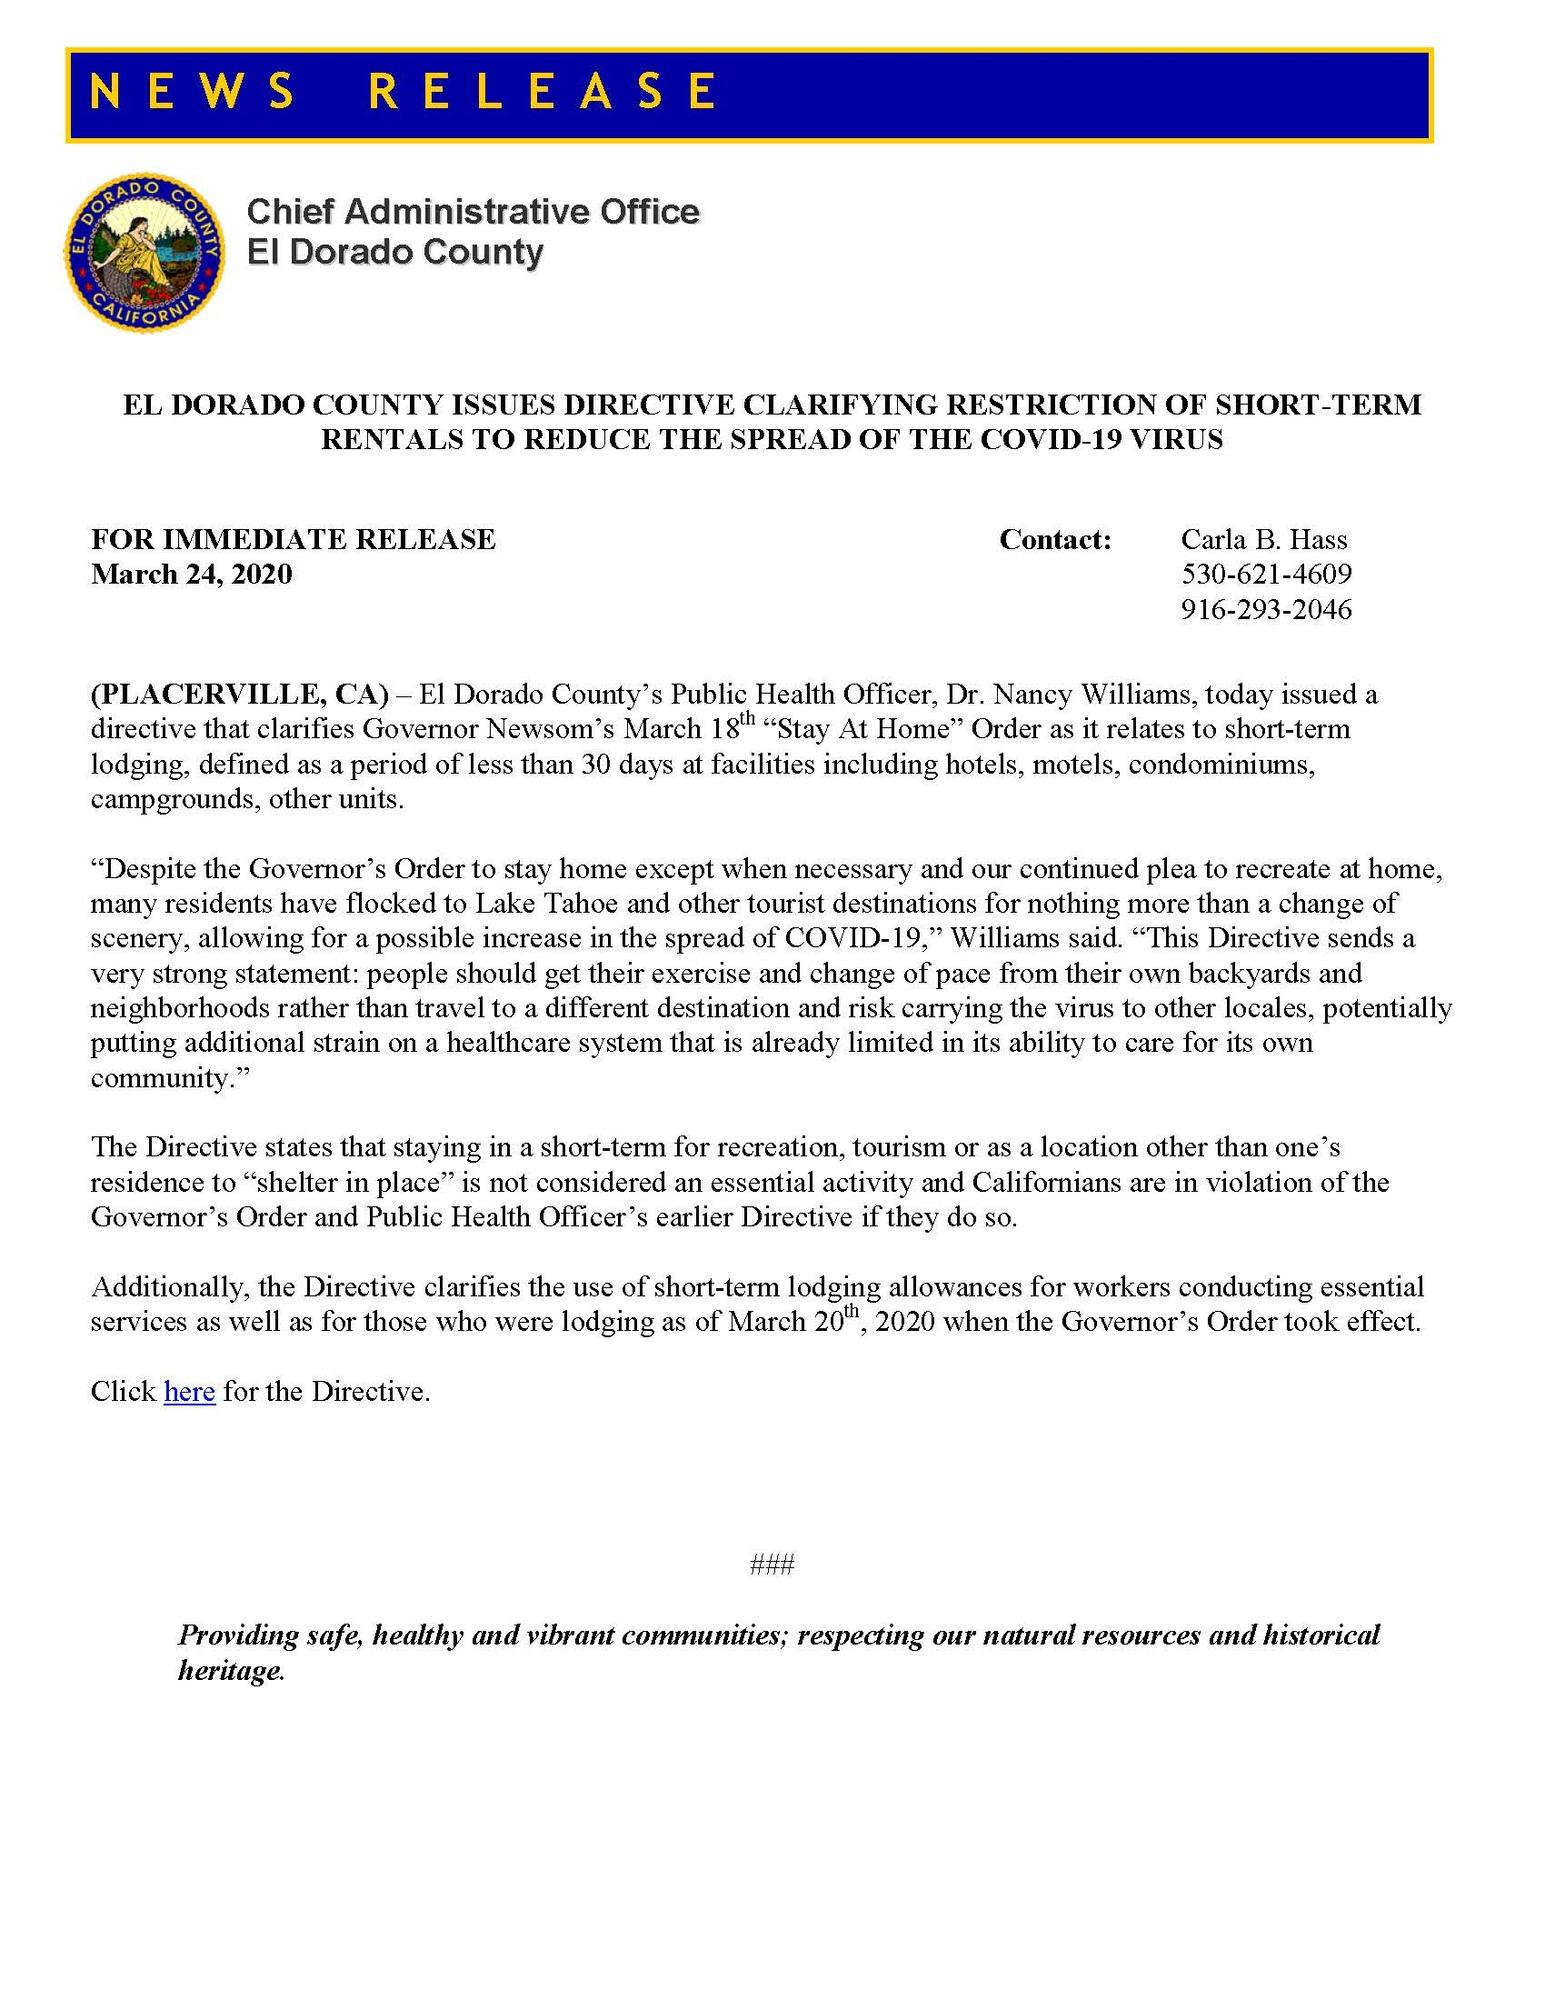 PR 20-11 COVID19 VHR Directive